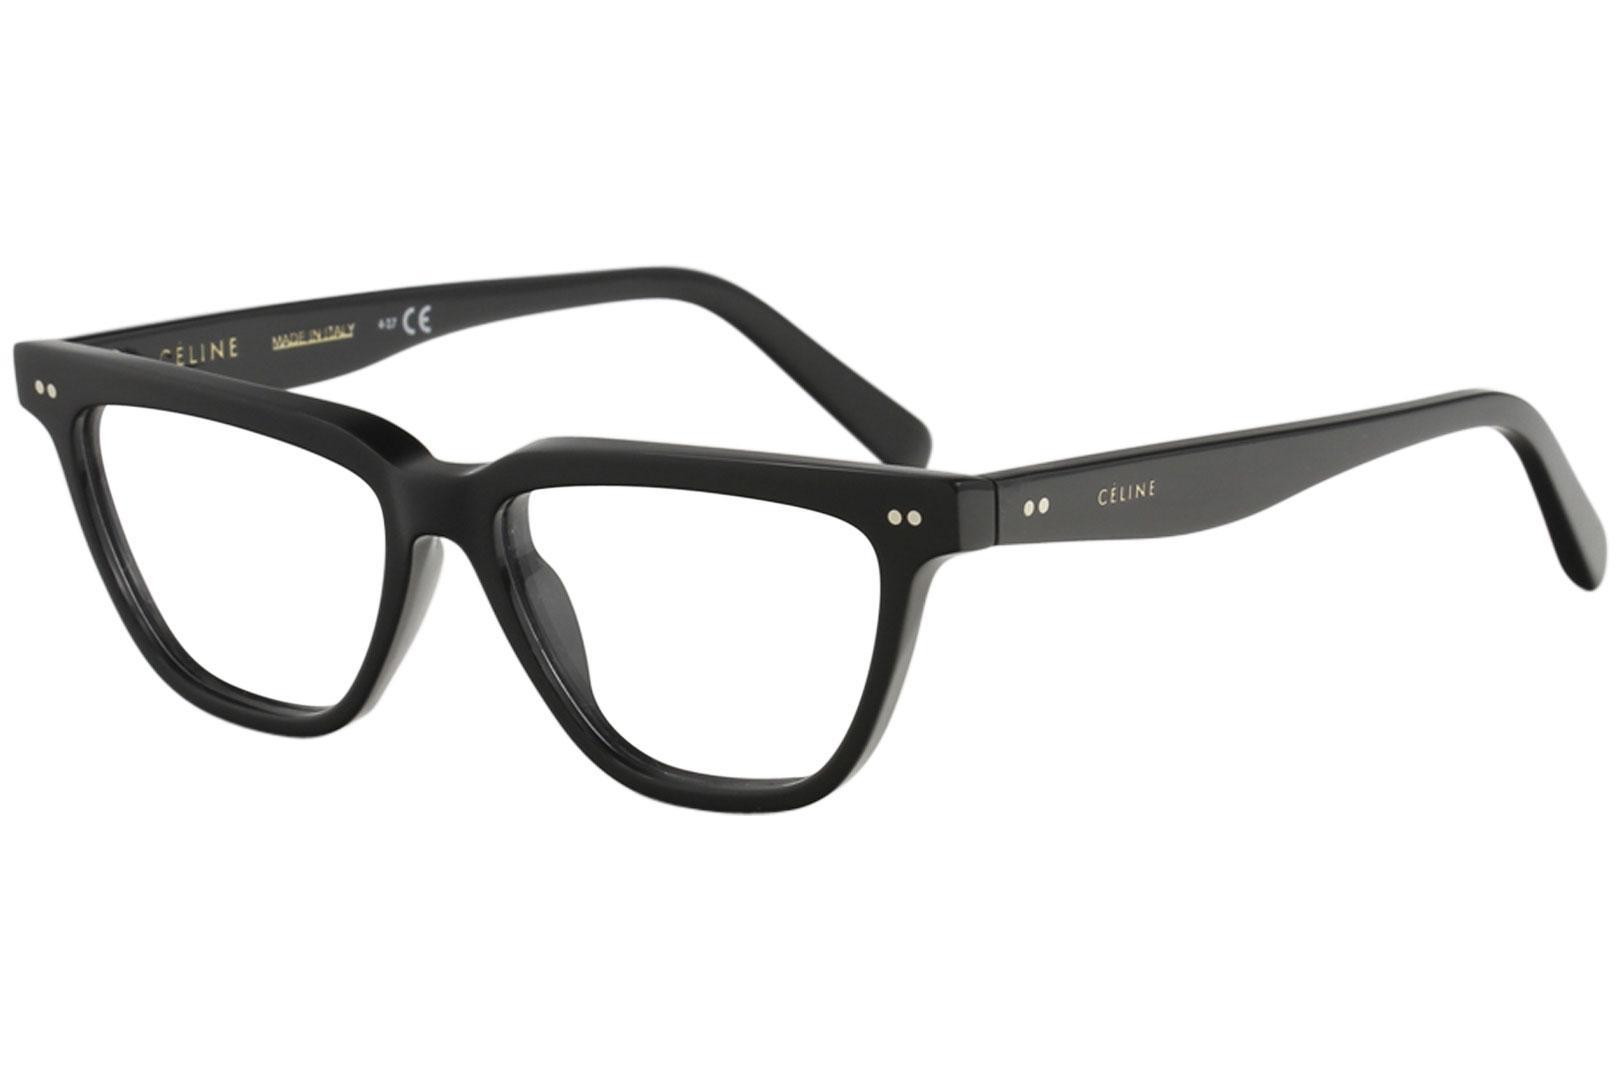 30f686db88d Celine Women s Eyeglasses CL50009I CL 50009 I Full Rim Optical Frame by  Celine. Hover to zoom